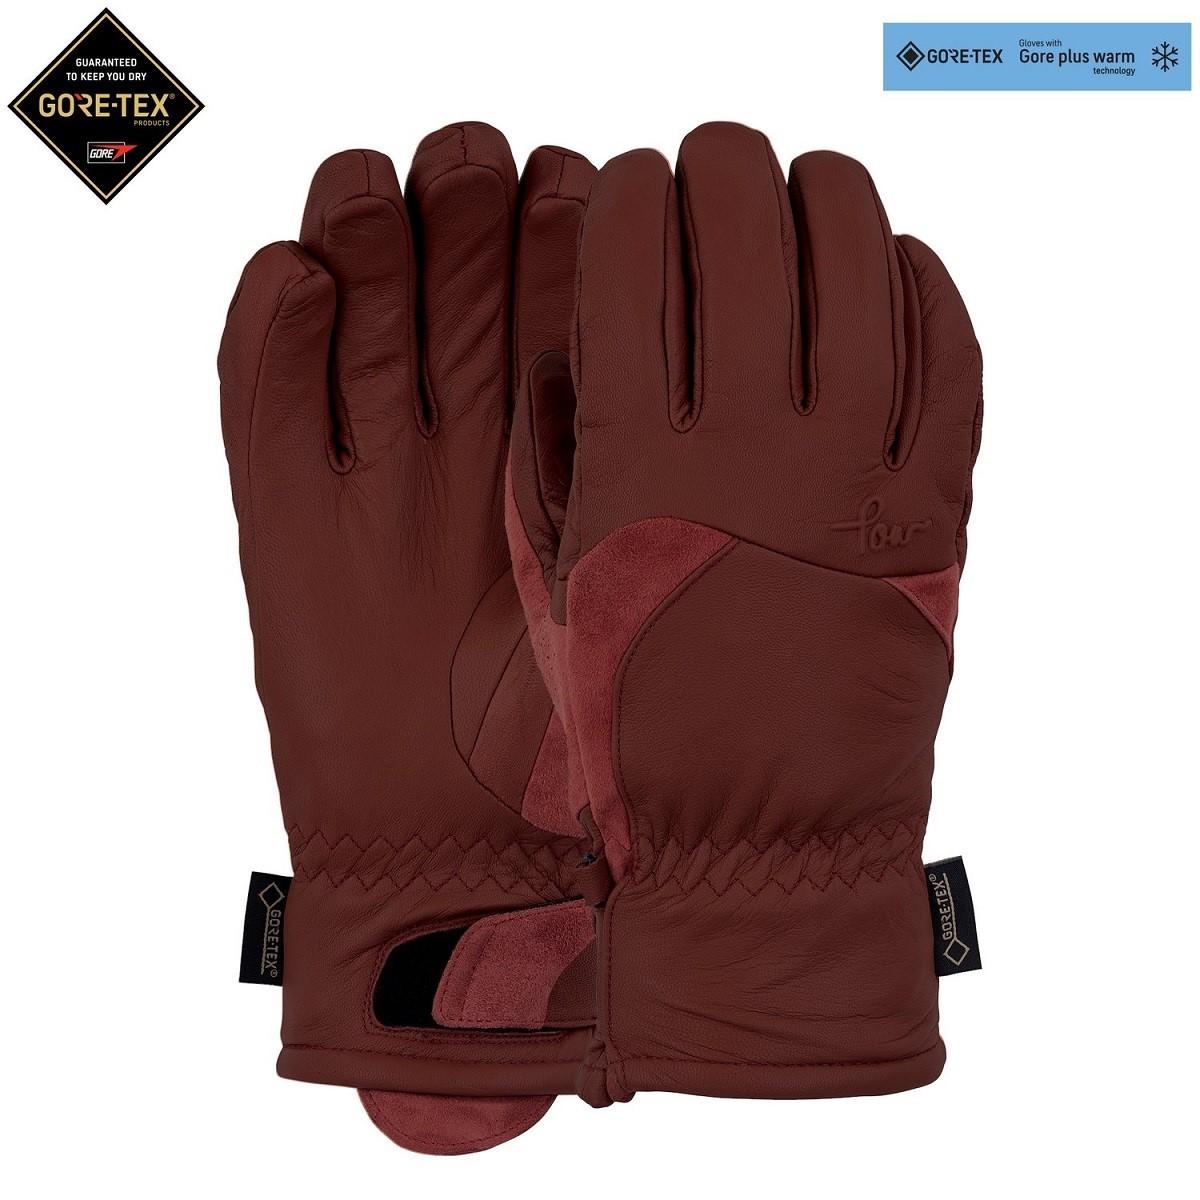 POW Womens Stealth GTX Glove +WARM